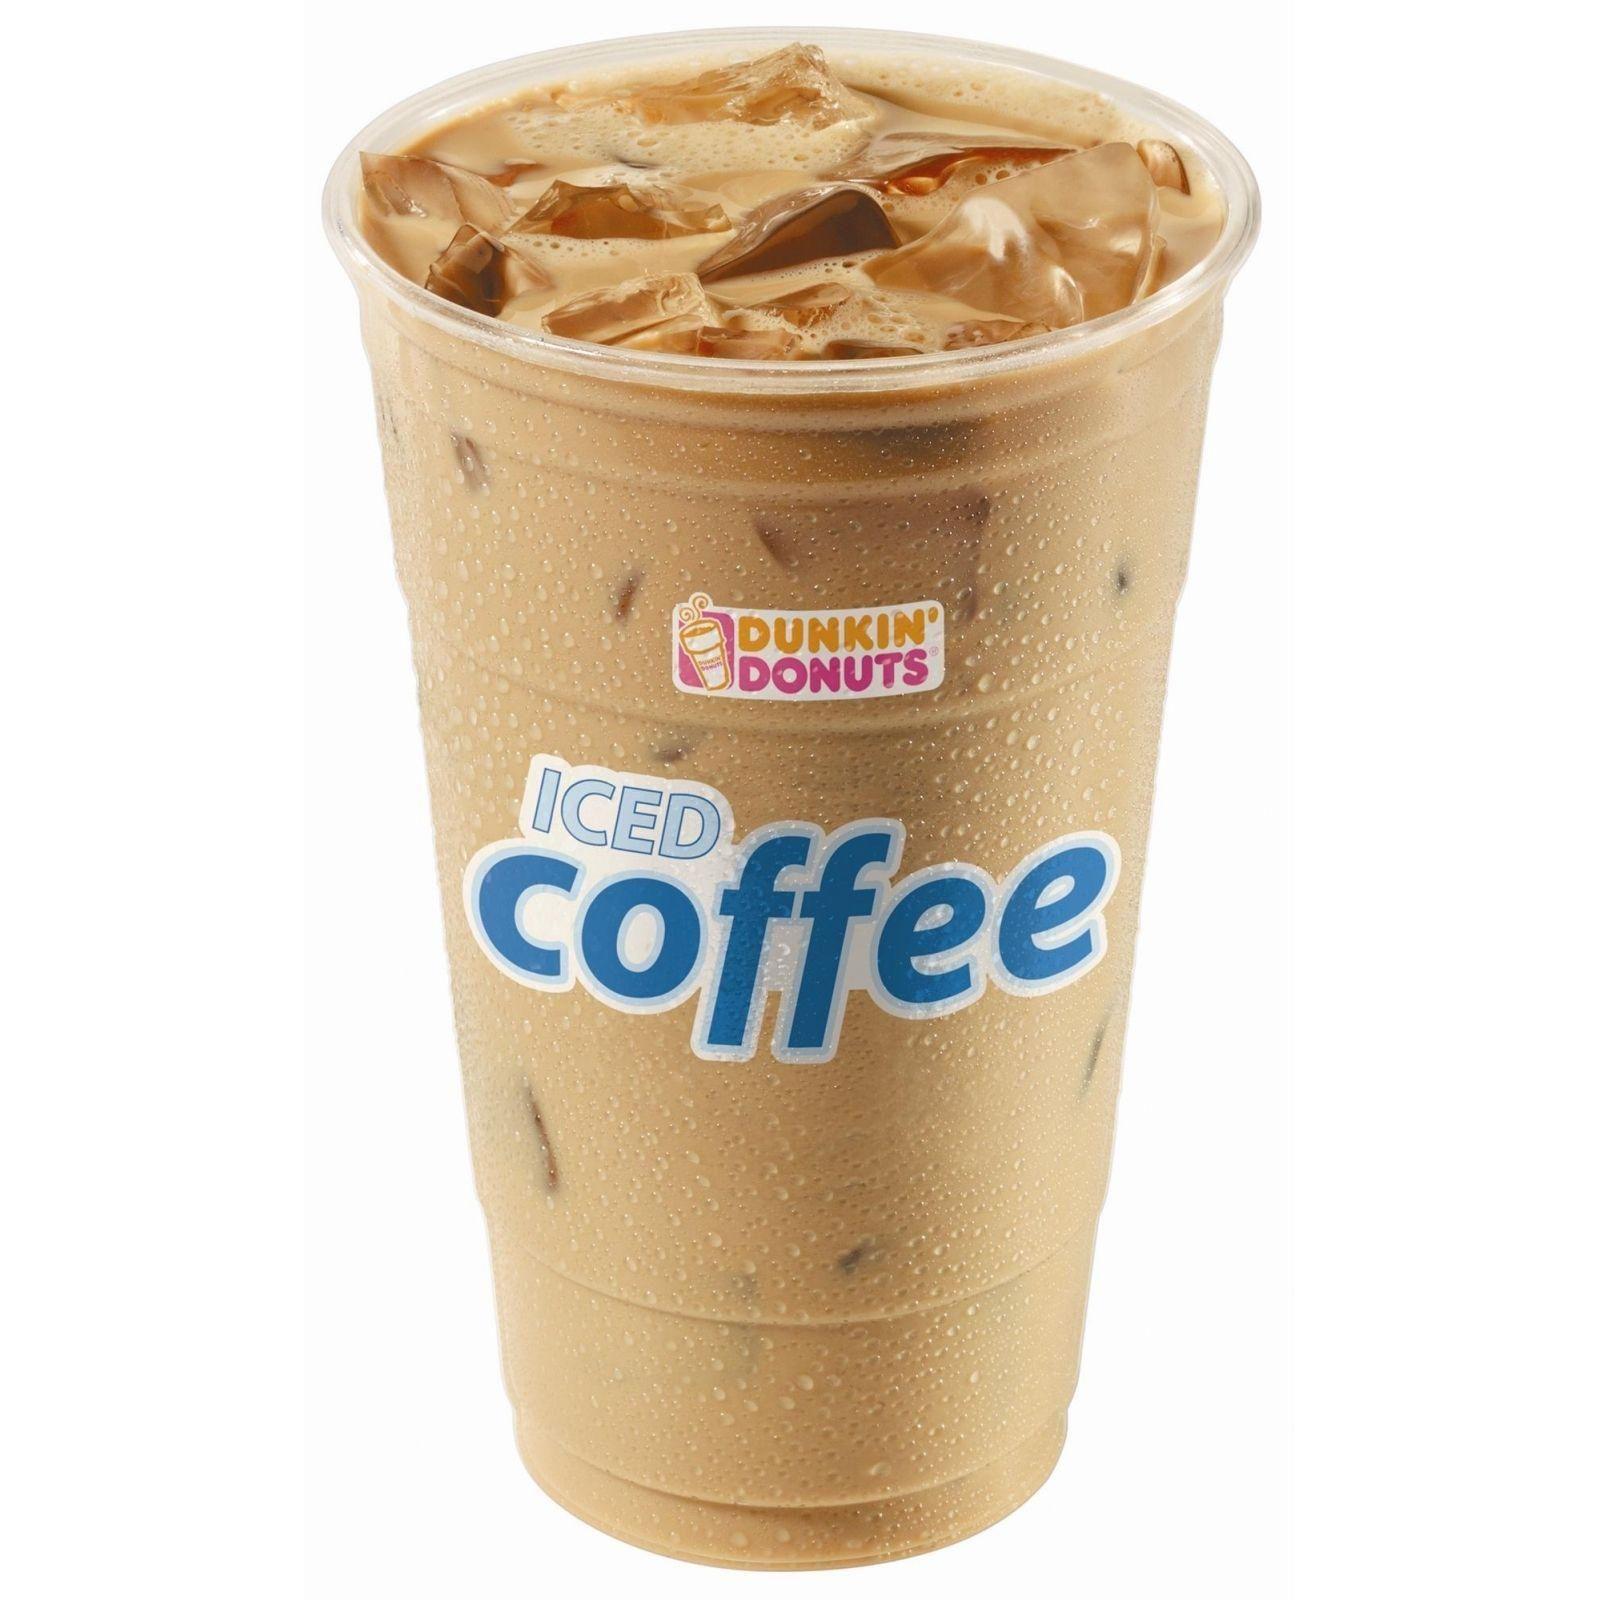 Free Dunkin Donuts White Chocolate Latte